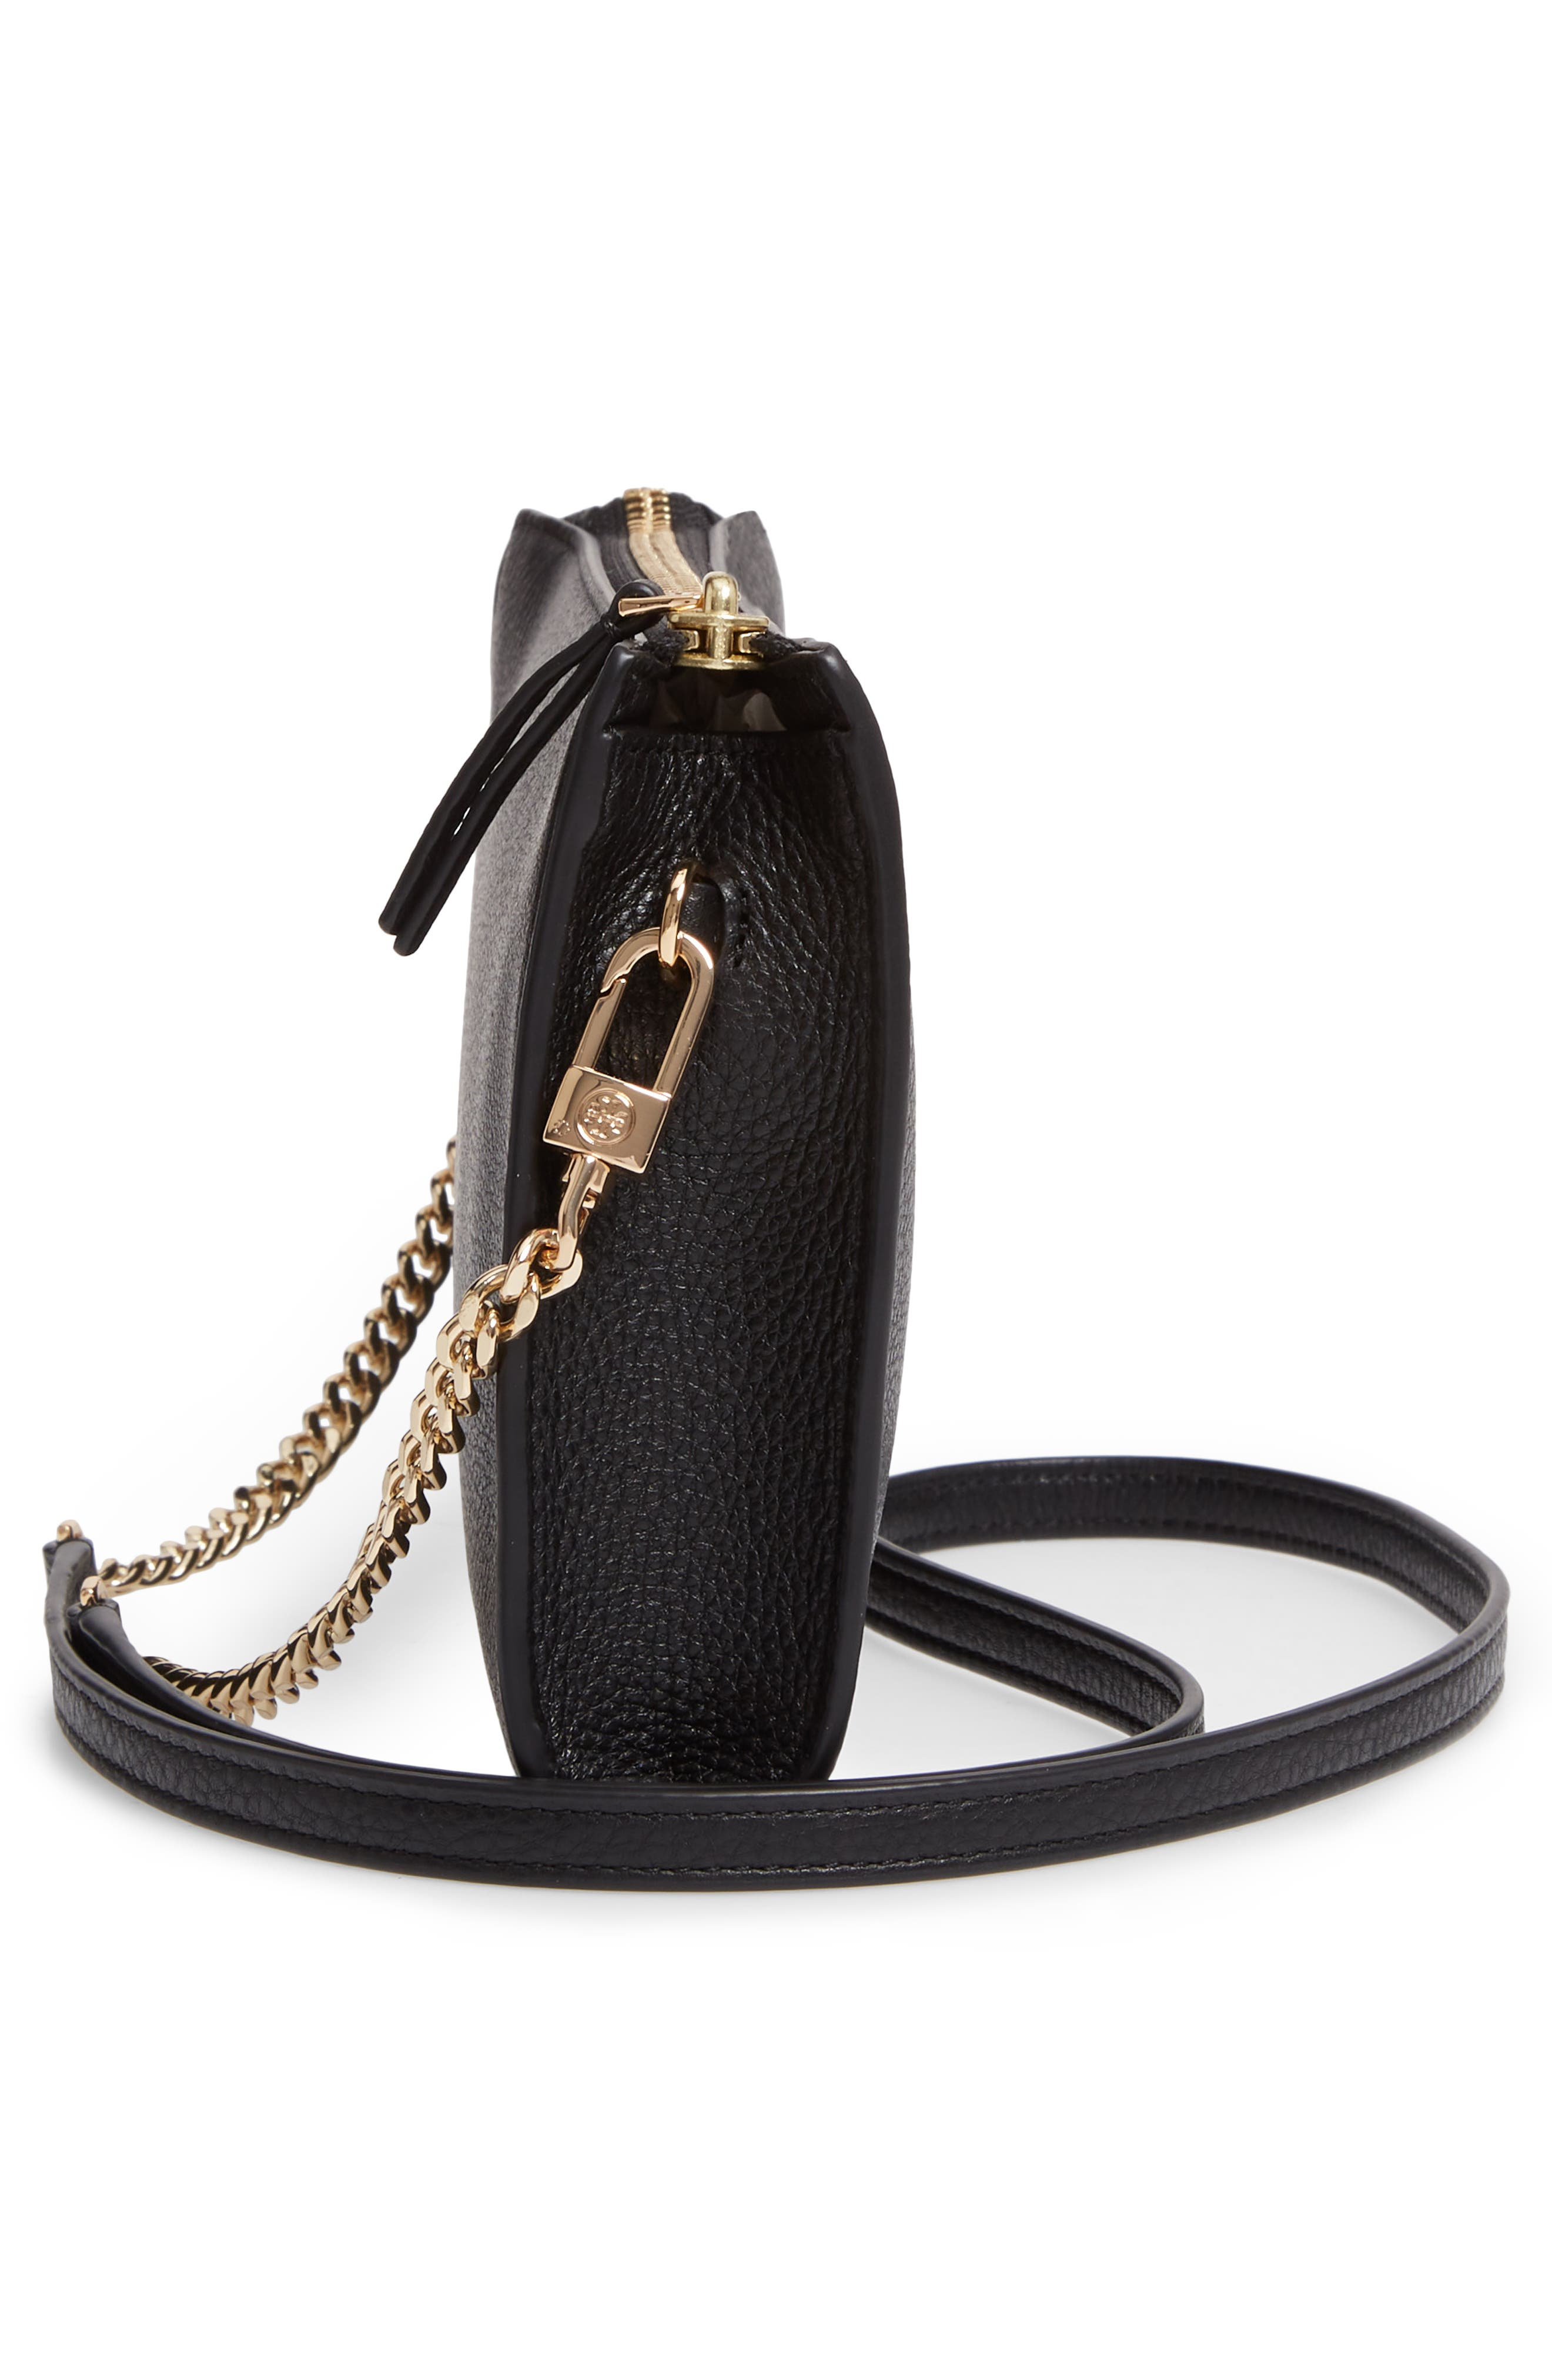 TORY BURCH,                             Pebbled Leather Top Zip Crossbody Bag,                             Alternate thumbnail 5, color,                             BLACK